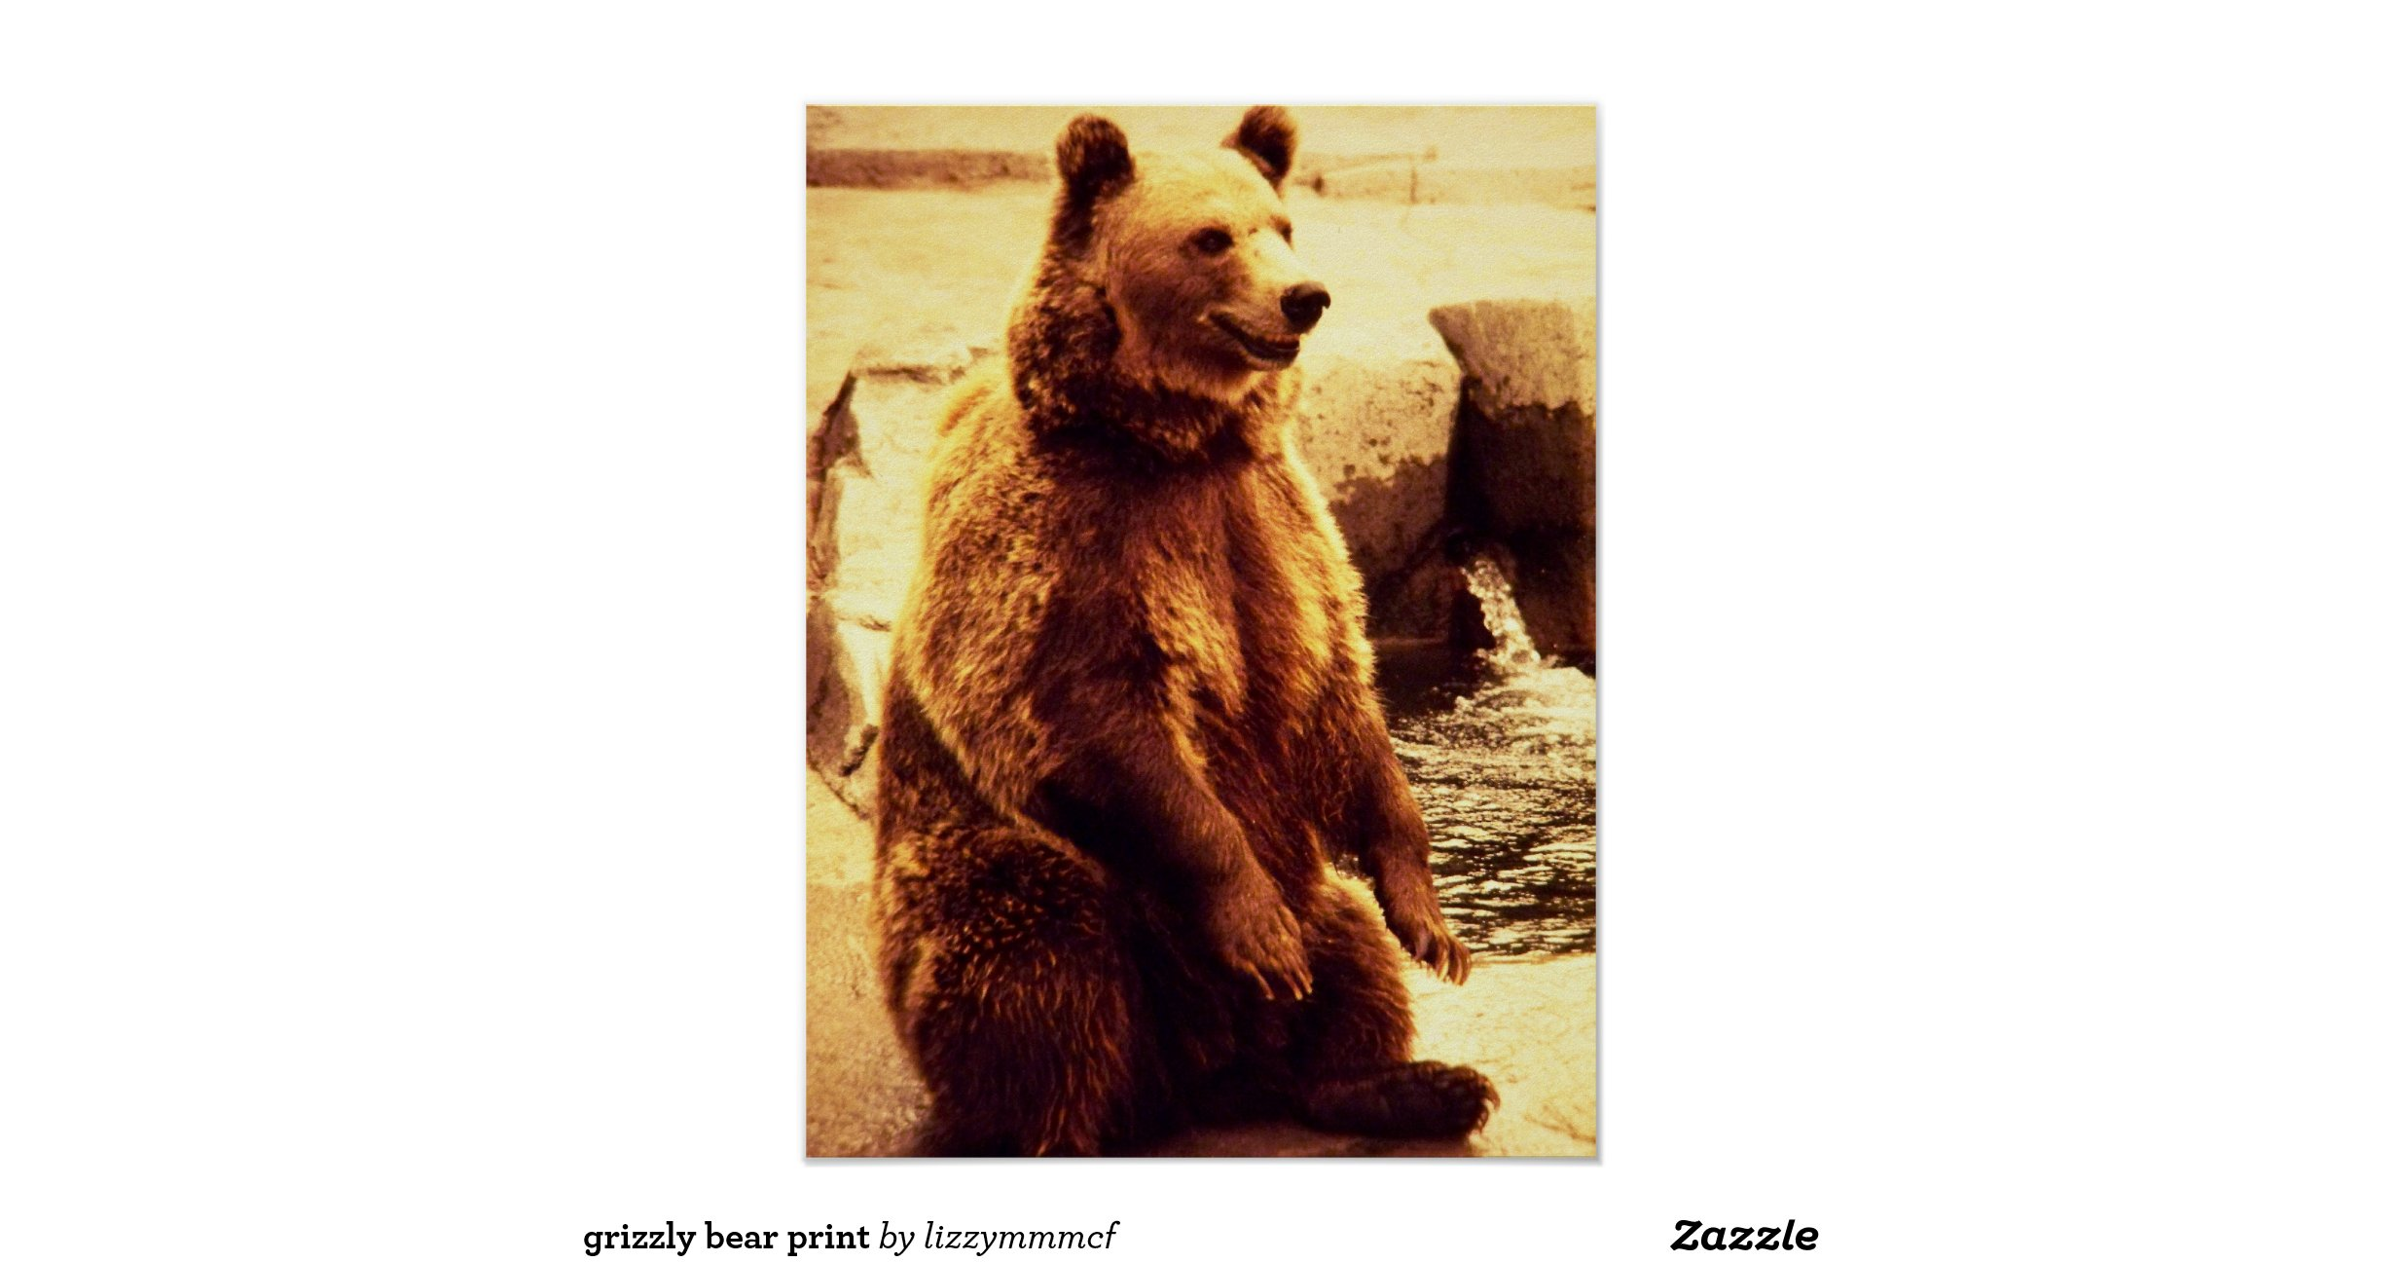 grizzly_bear_print-r67a7e9ced291489f9ae96adff5b55eeb_w5b ...